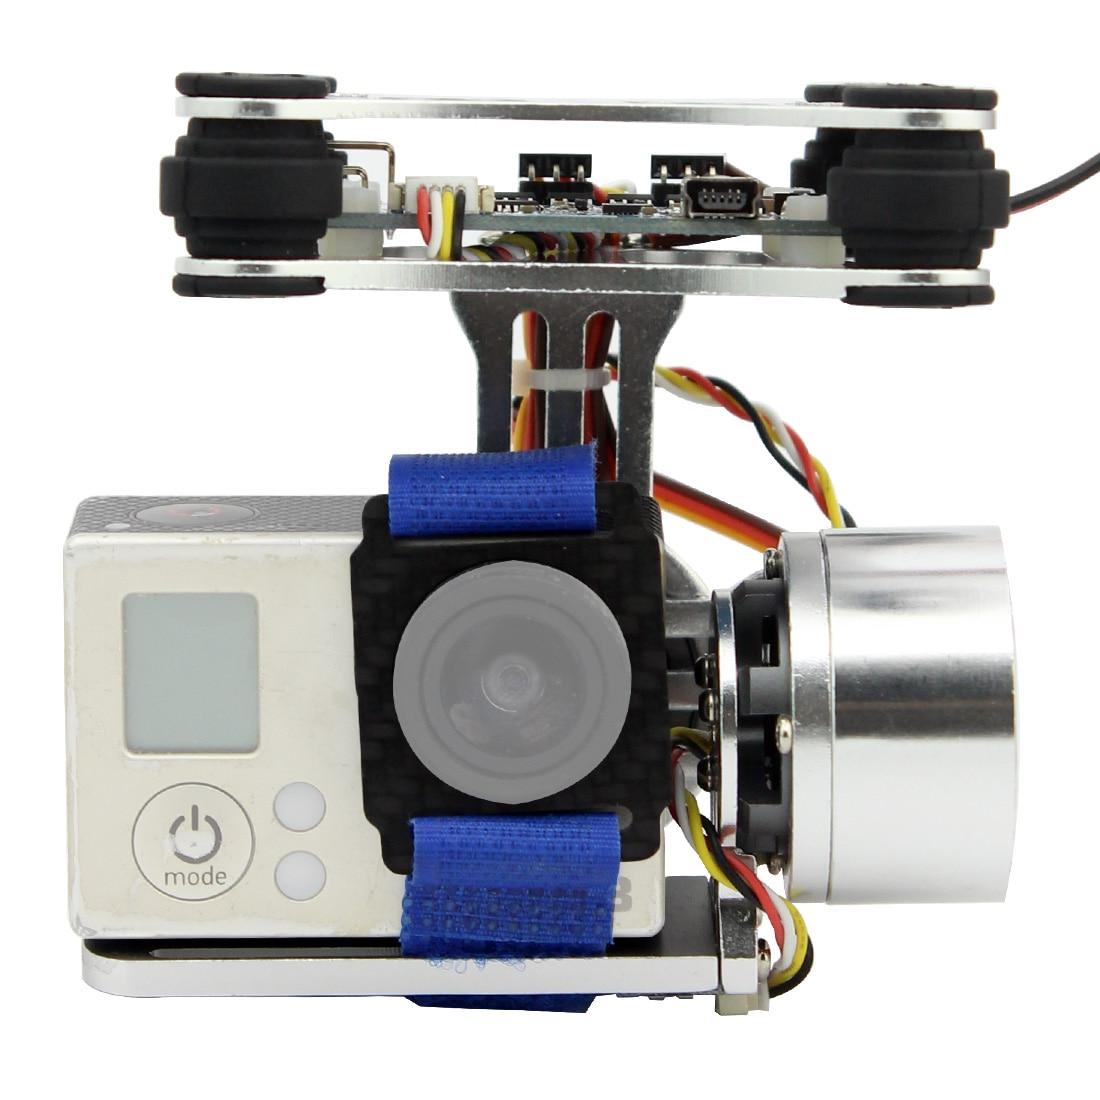 F06885 Aluminum 2-axle Brushless Gimbal Camera Mount Controller Plug&Play for DIY  Quadcopter Trex 500 550 Aircraft No Manual 2015 hot sale quadcopter 3 axis gimbal brushless ptz dys w 4108 motor evvgc controller for nex ildc camera